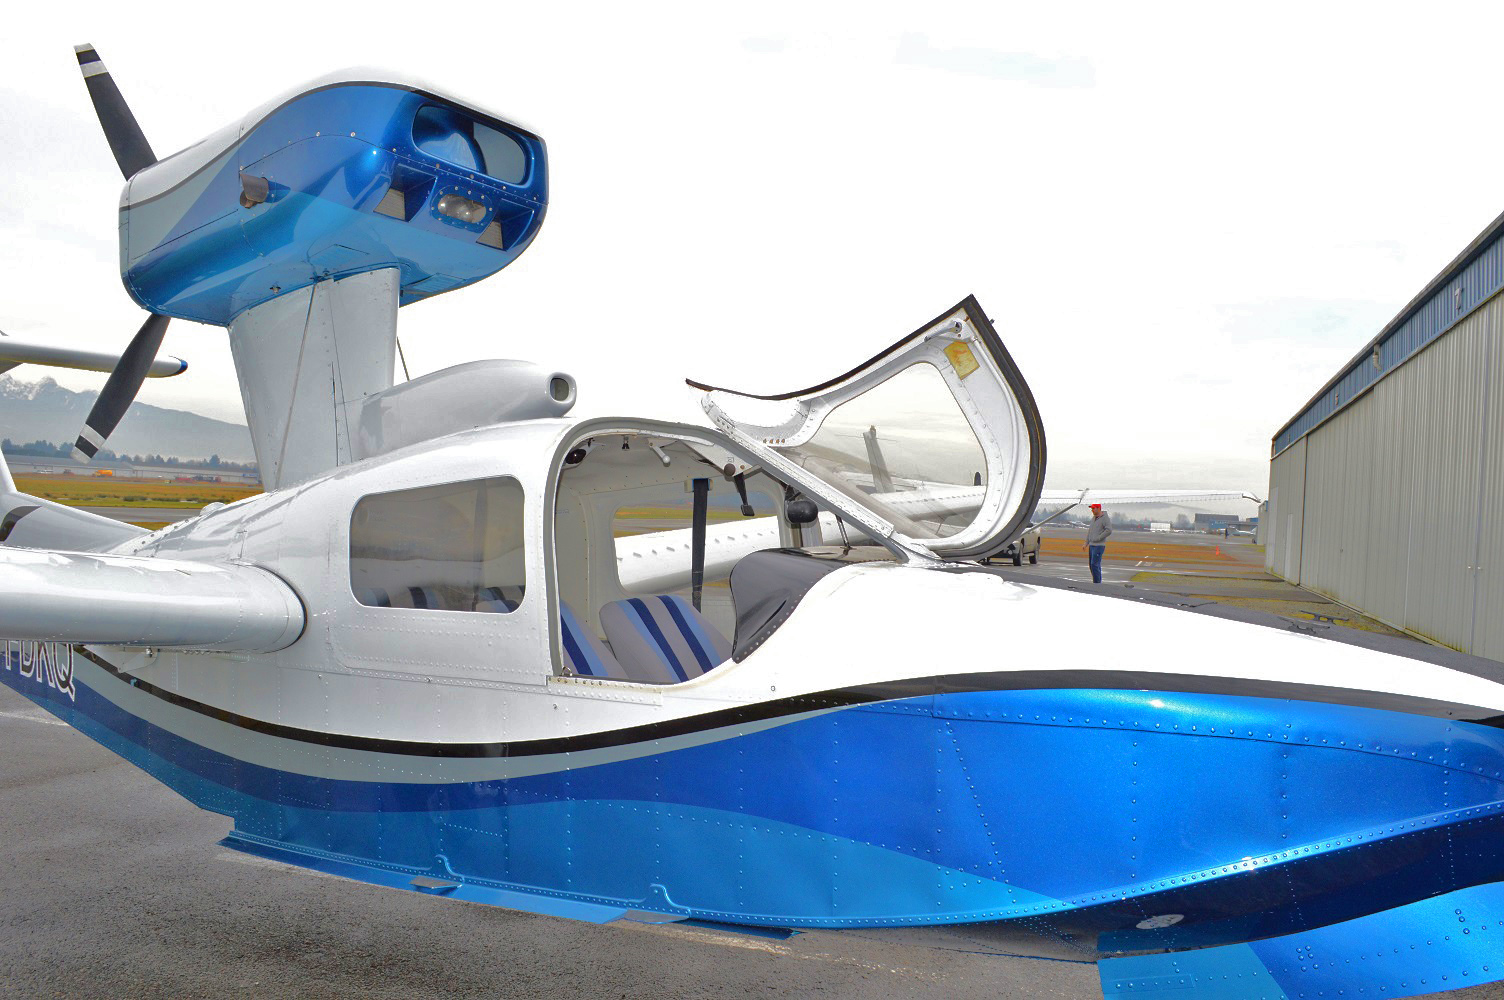 Lake LA-4-250 exterior